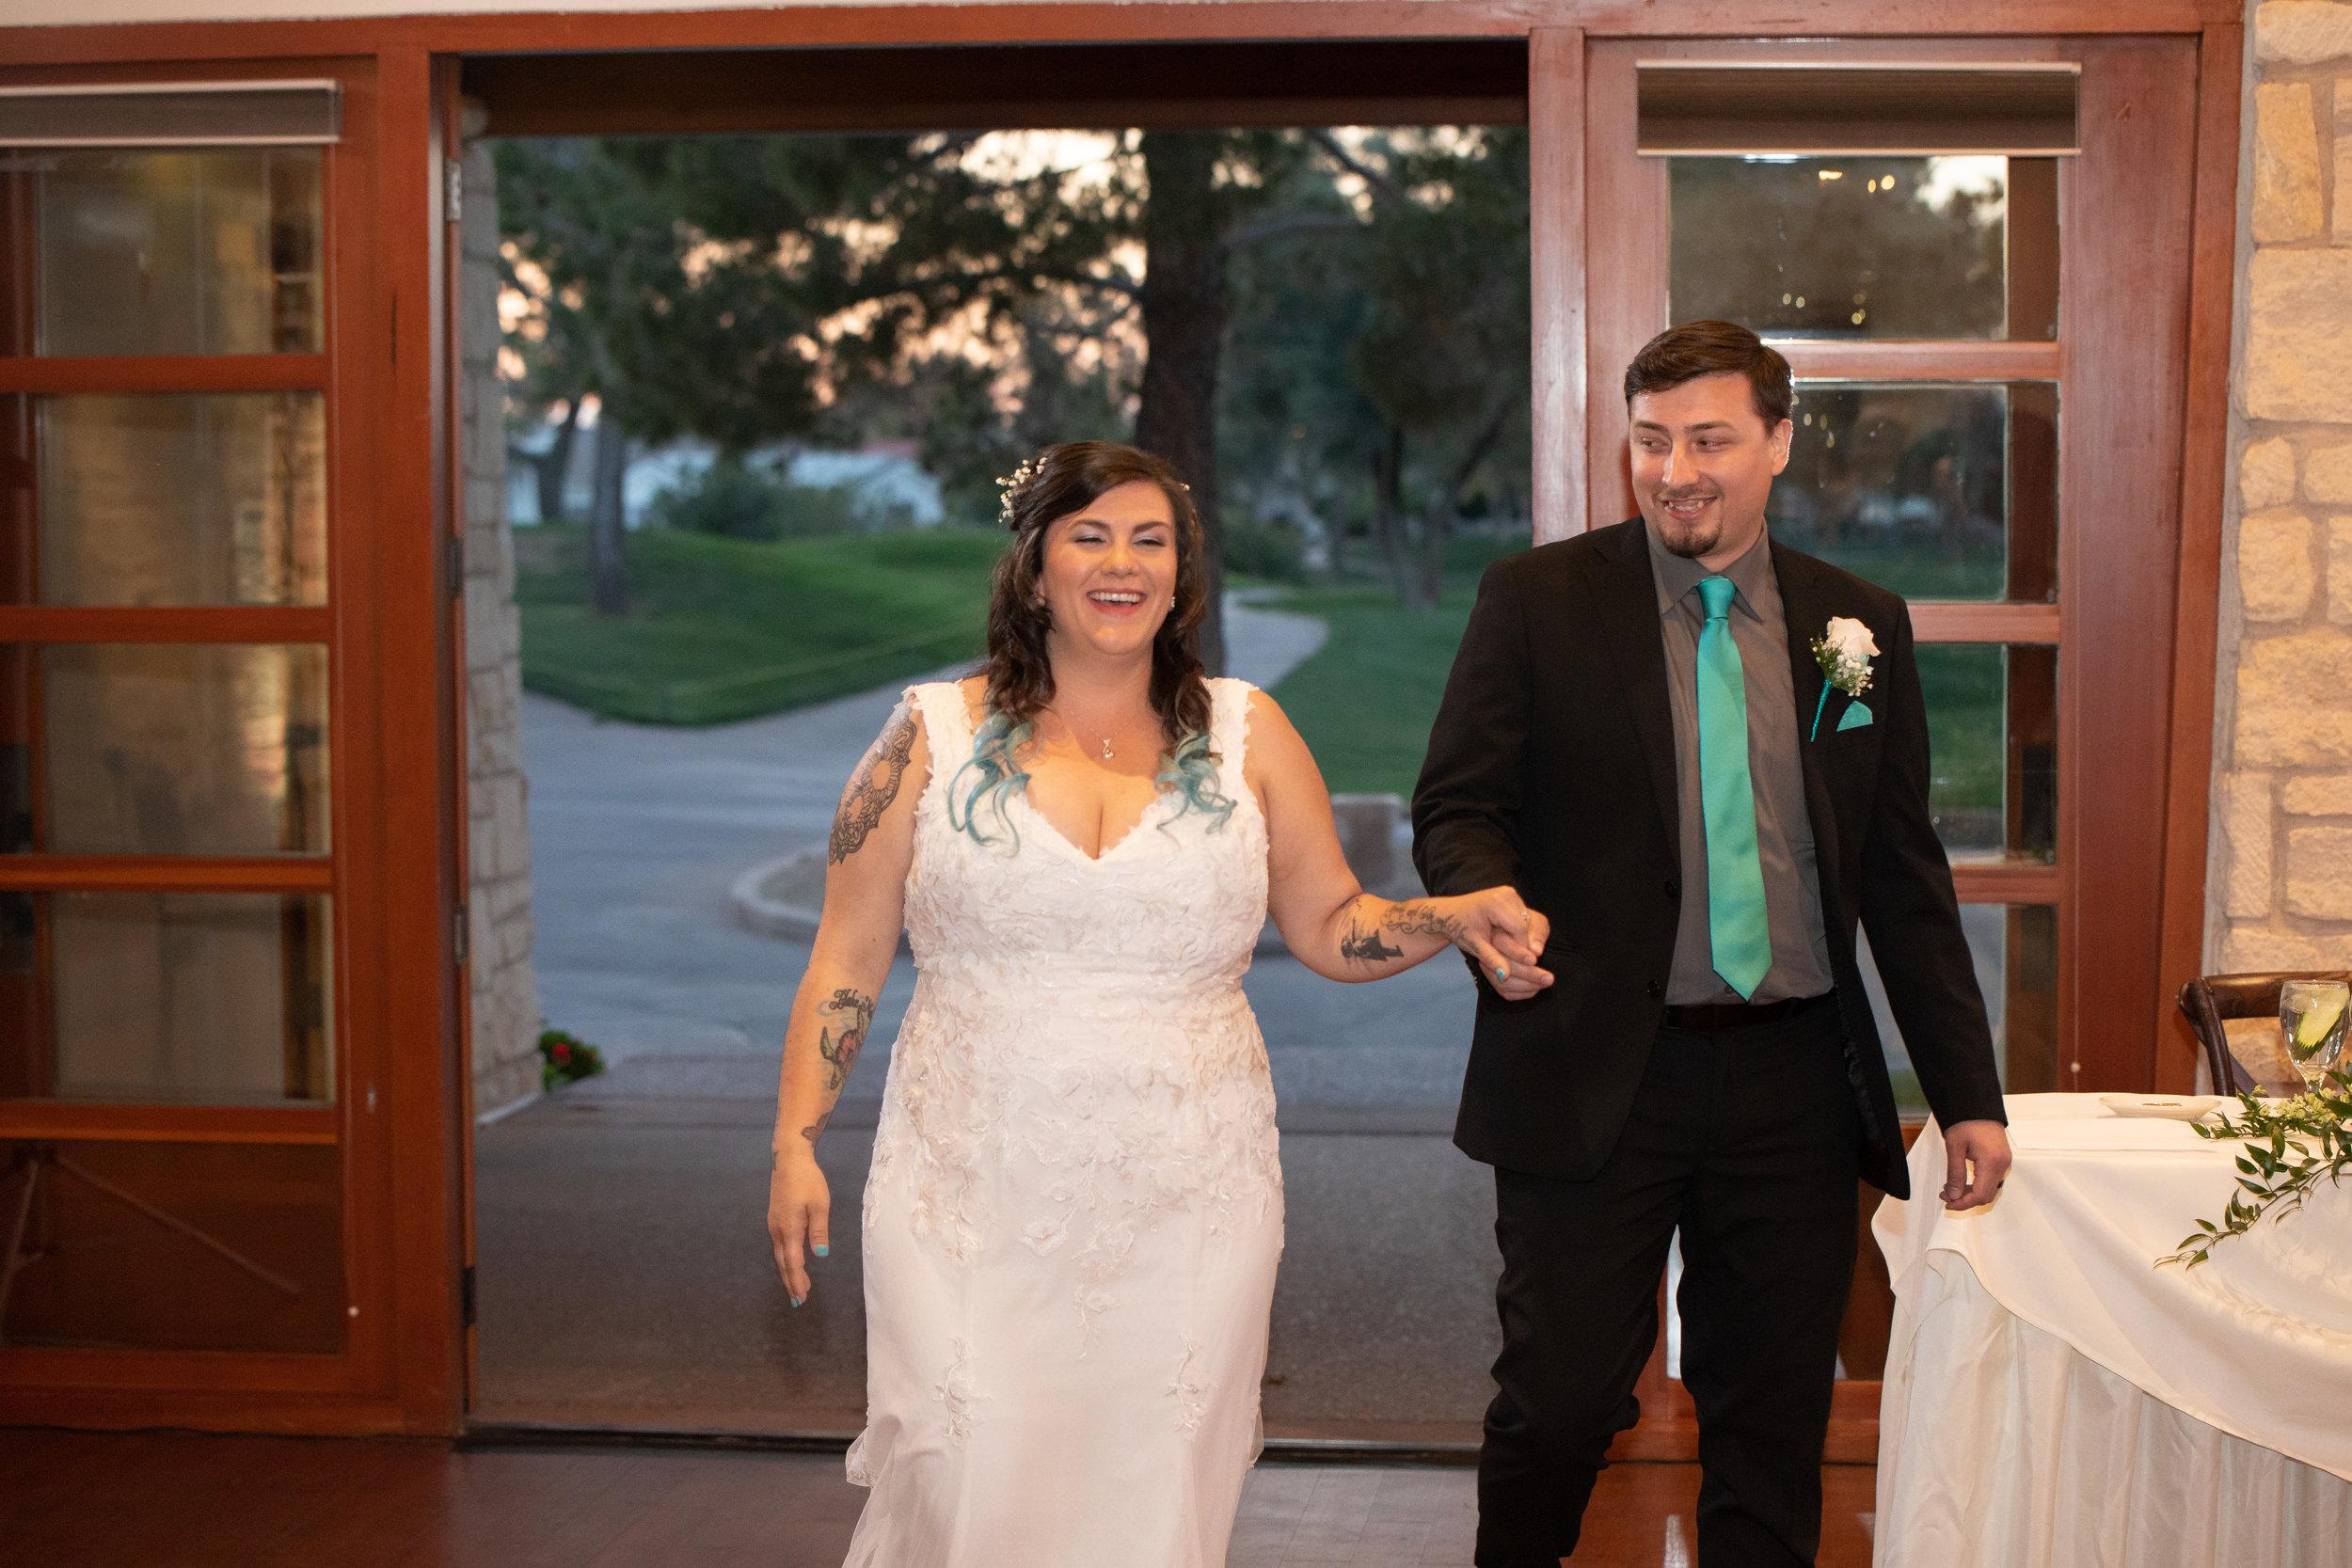 Carlos-Kayla-Wedgewood-Wedding-Tara-Nichole-Photo-Chandler-Arizona-3.jpg